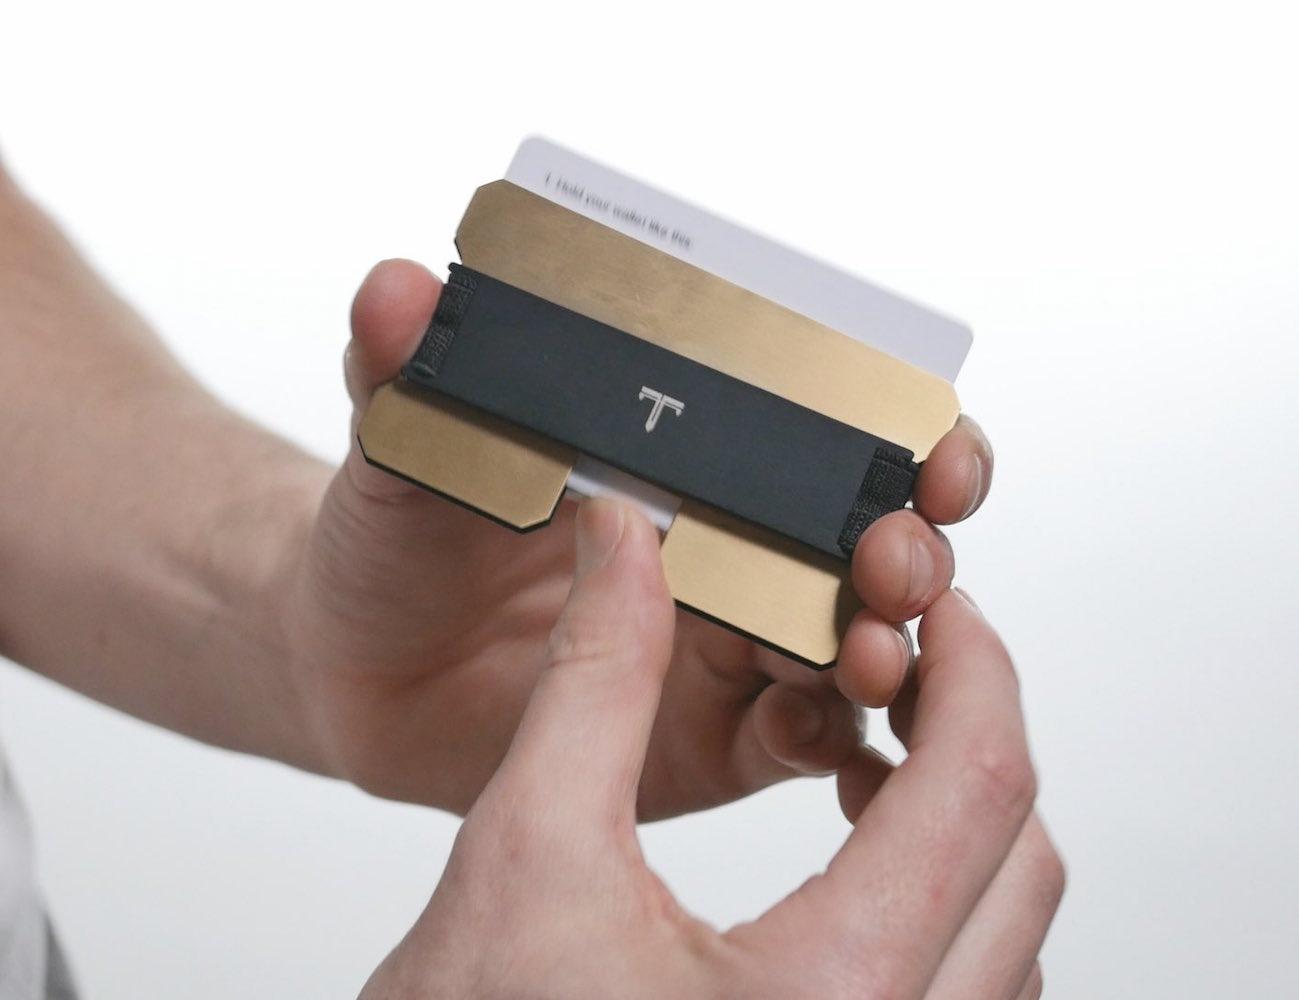 Tribe 3.0 – The Sexiest Minimalist Wallet